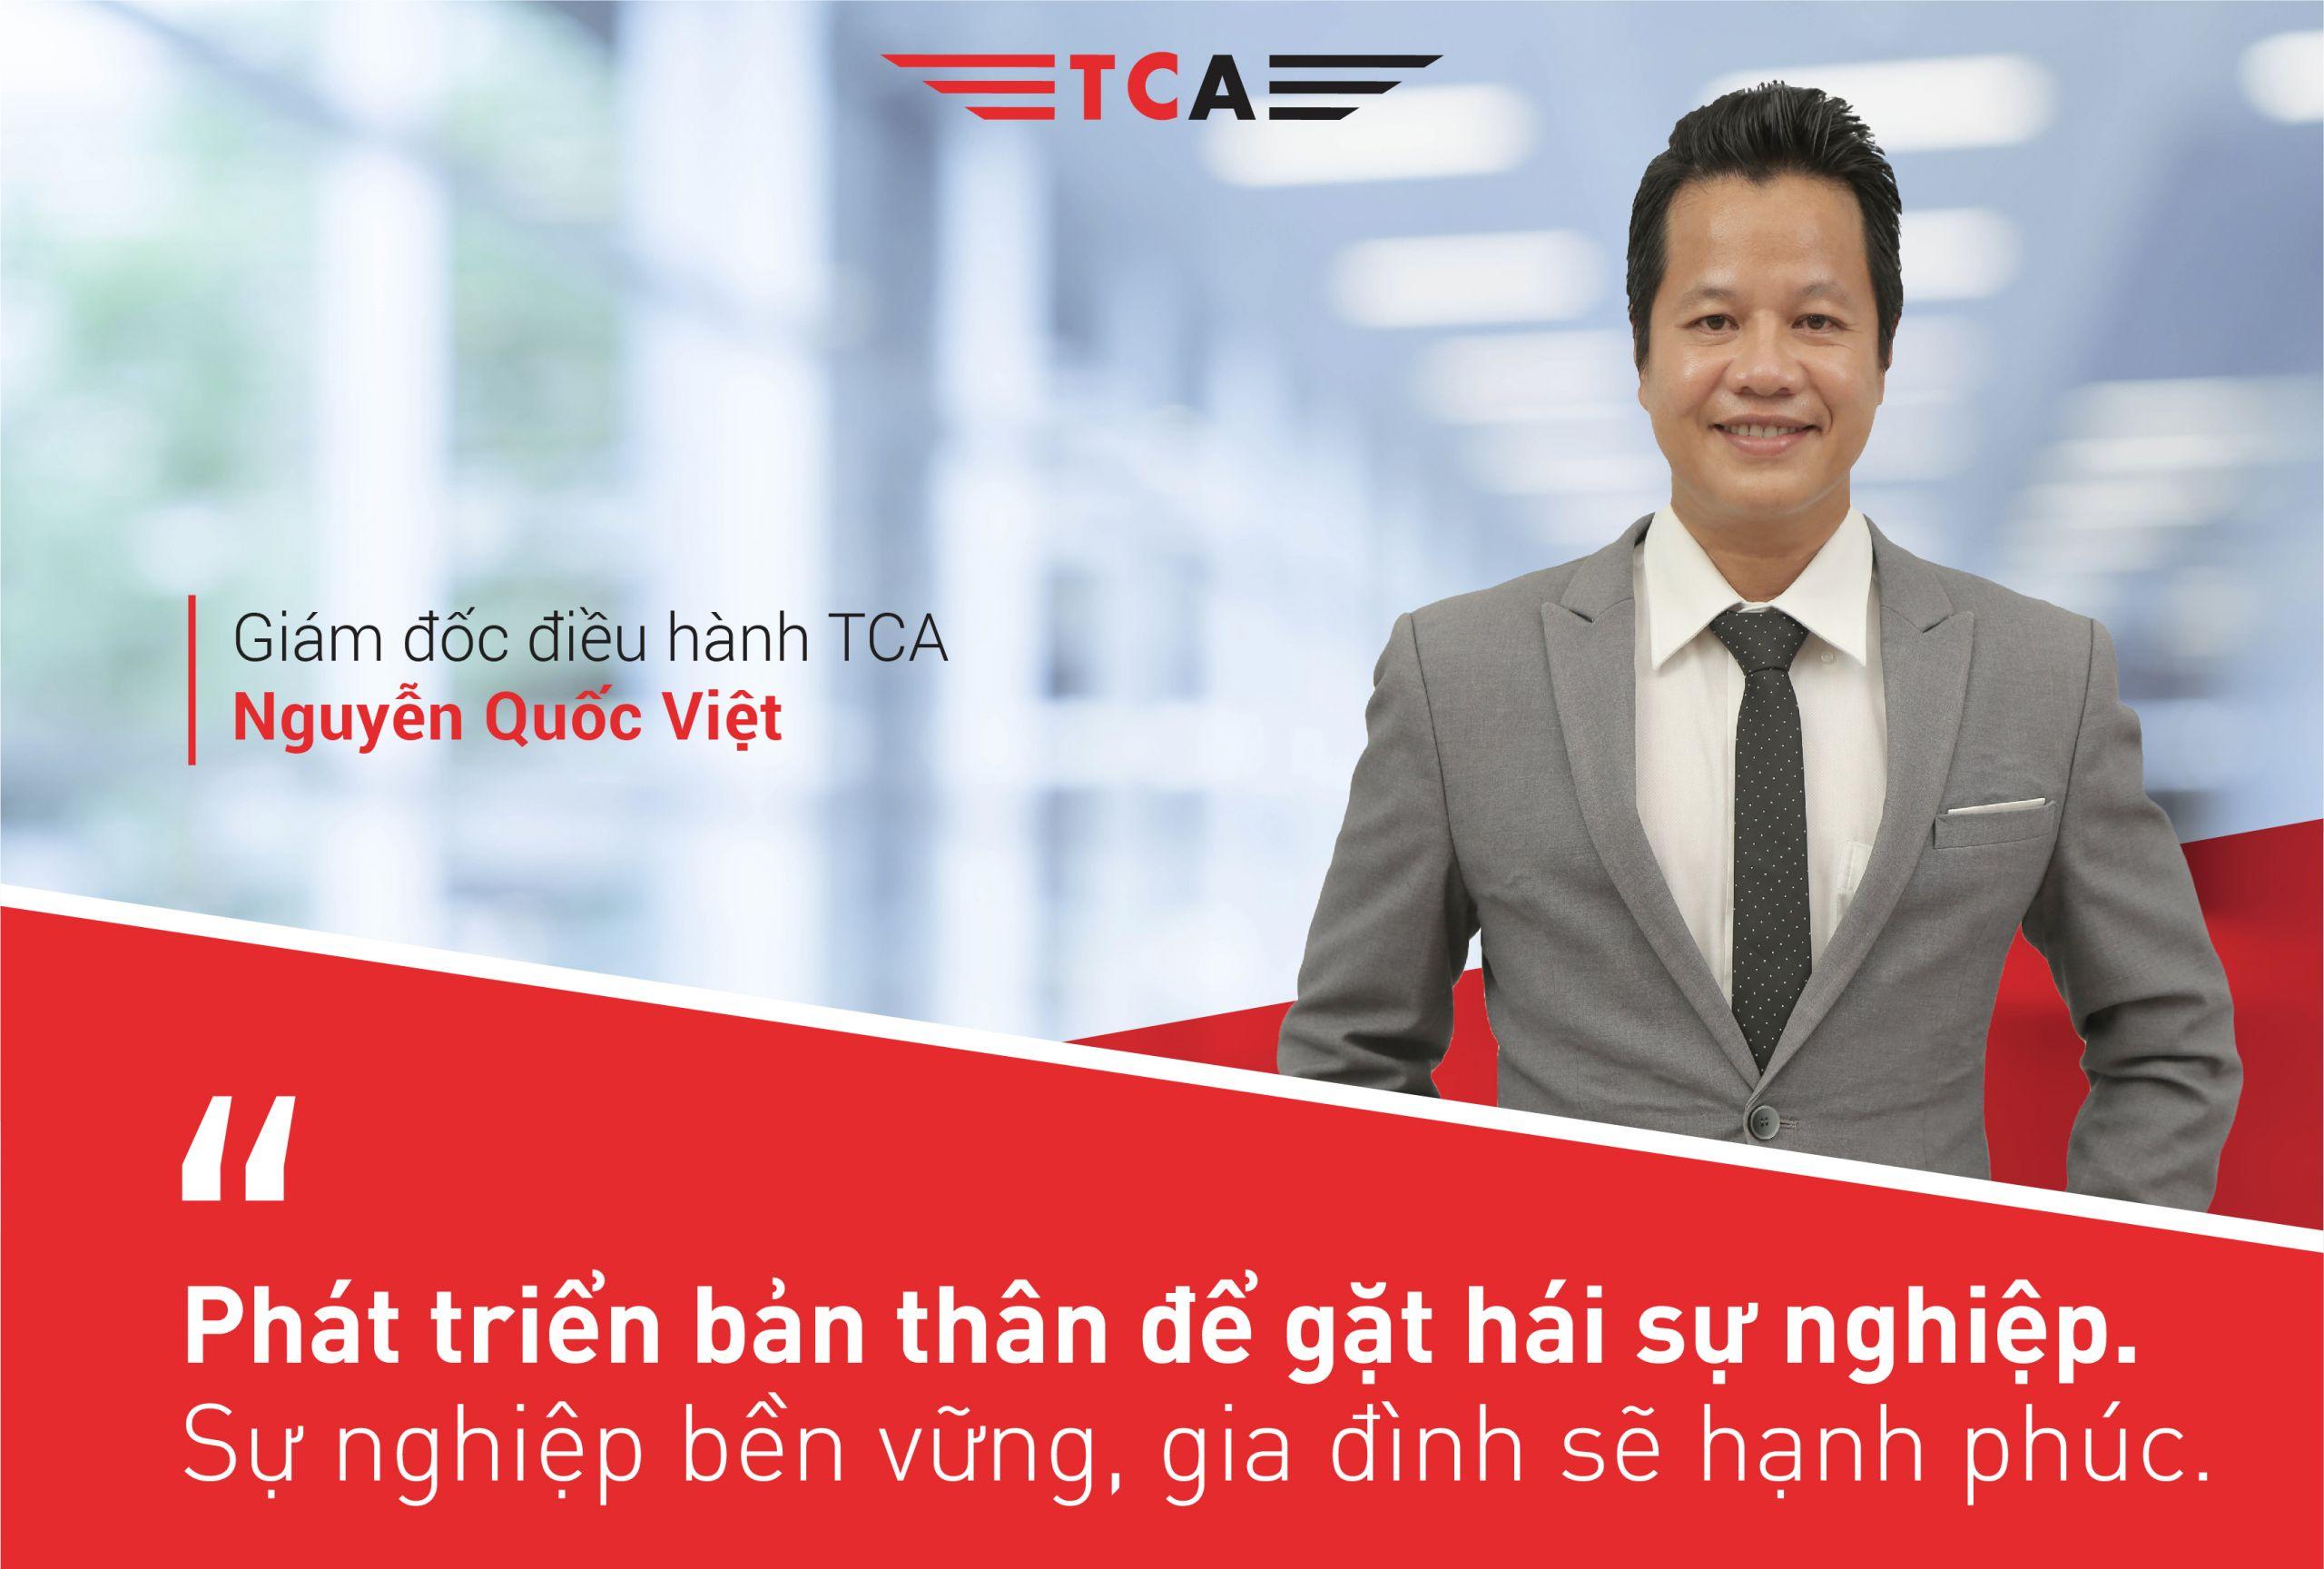 Nguyen Quoc Viet